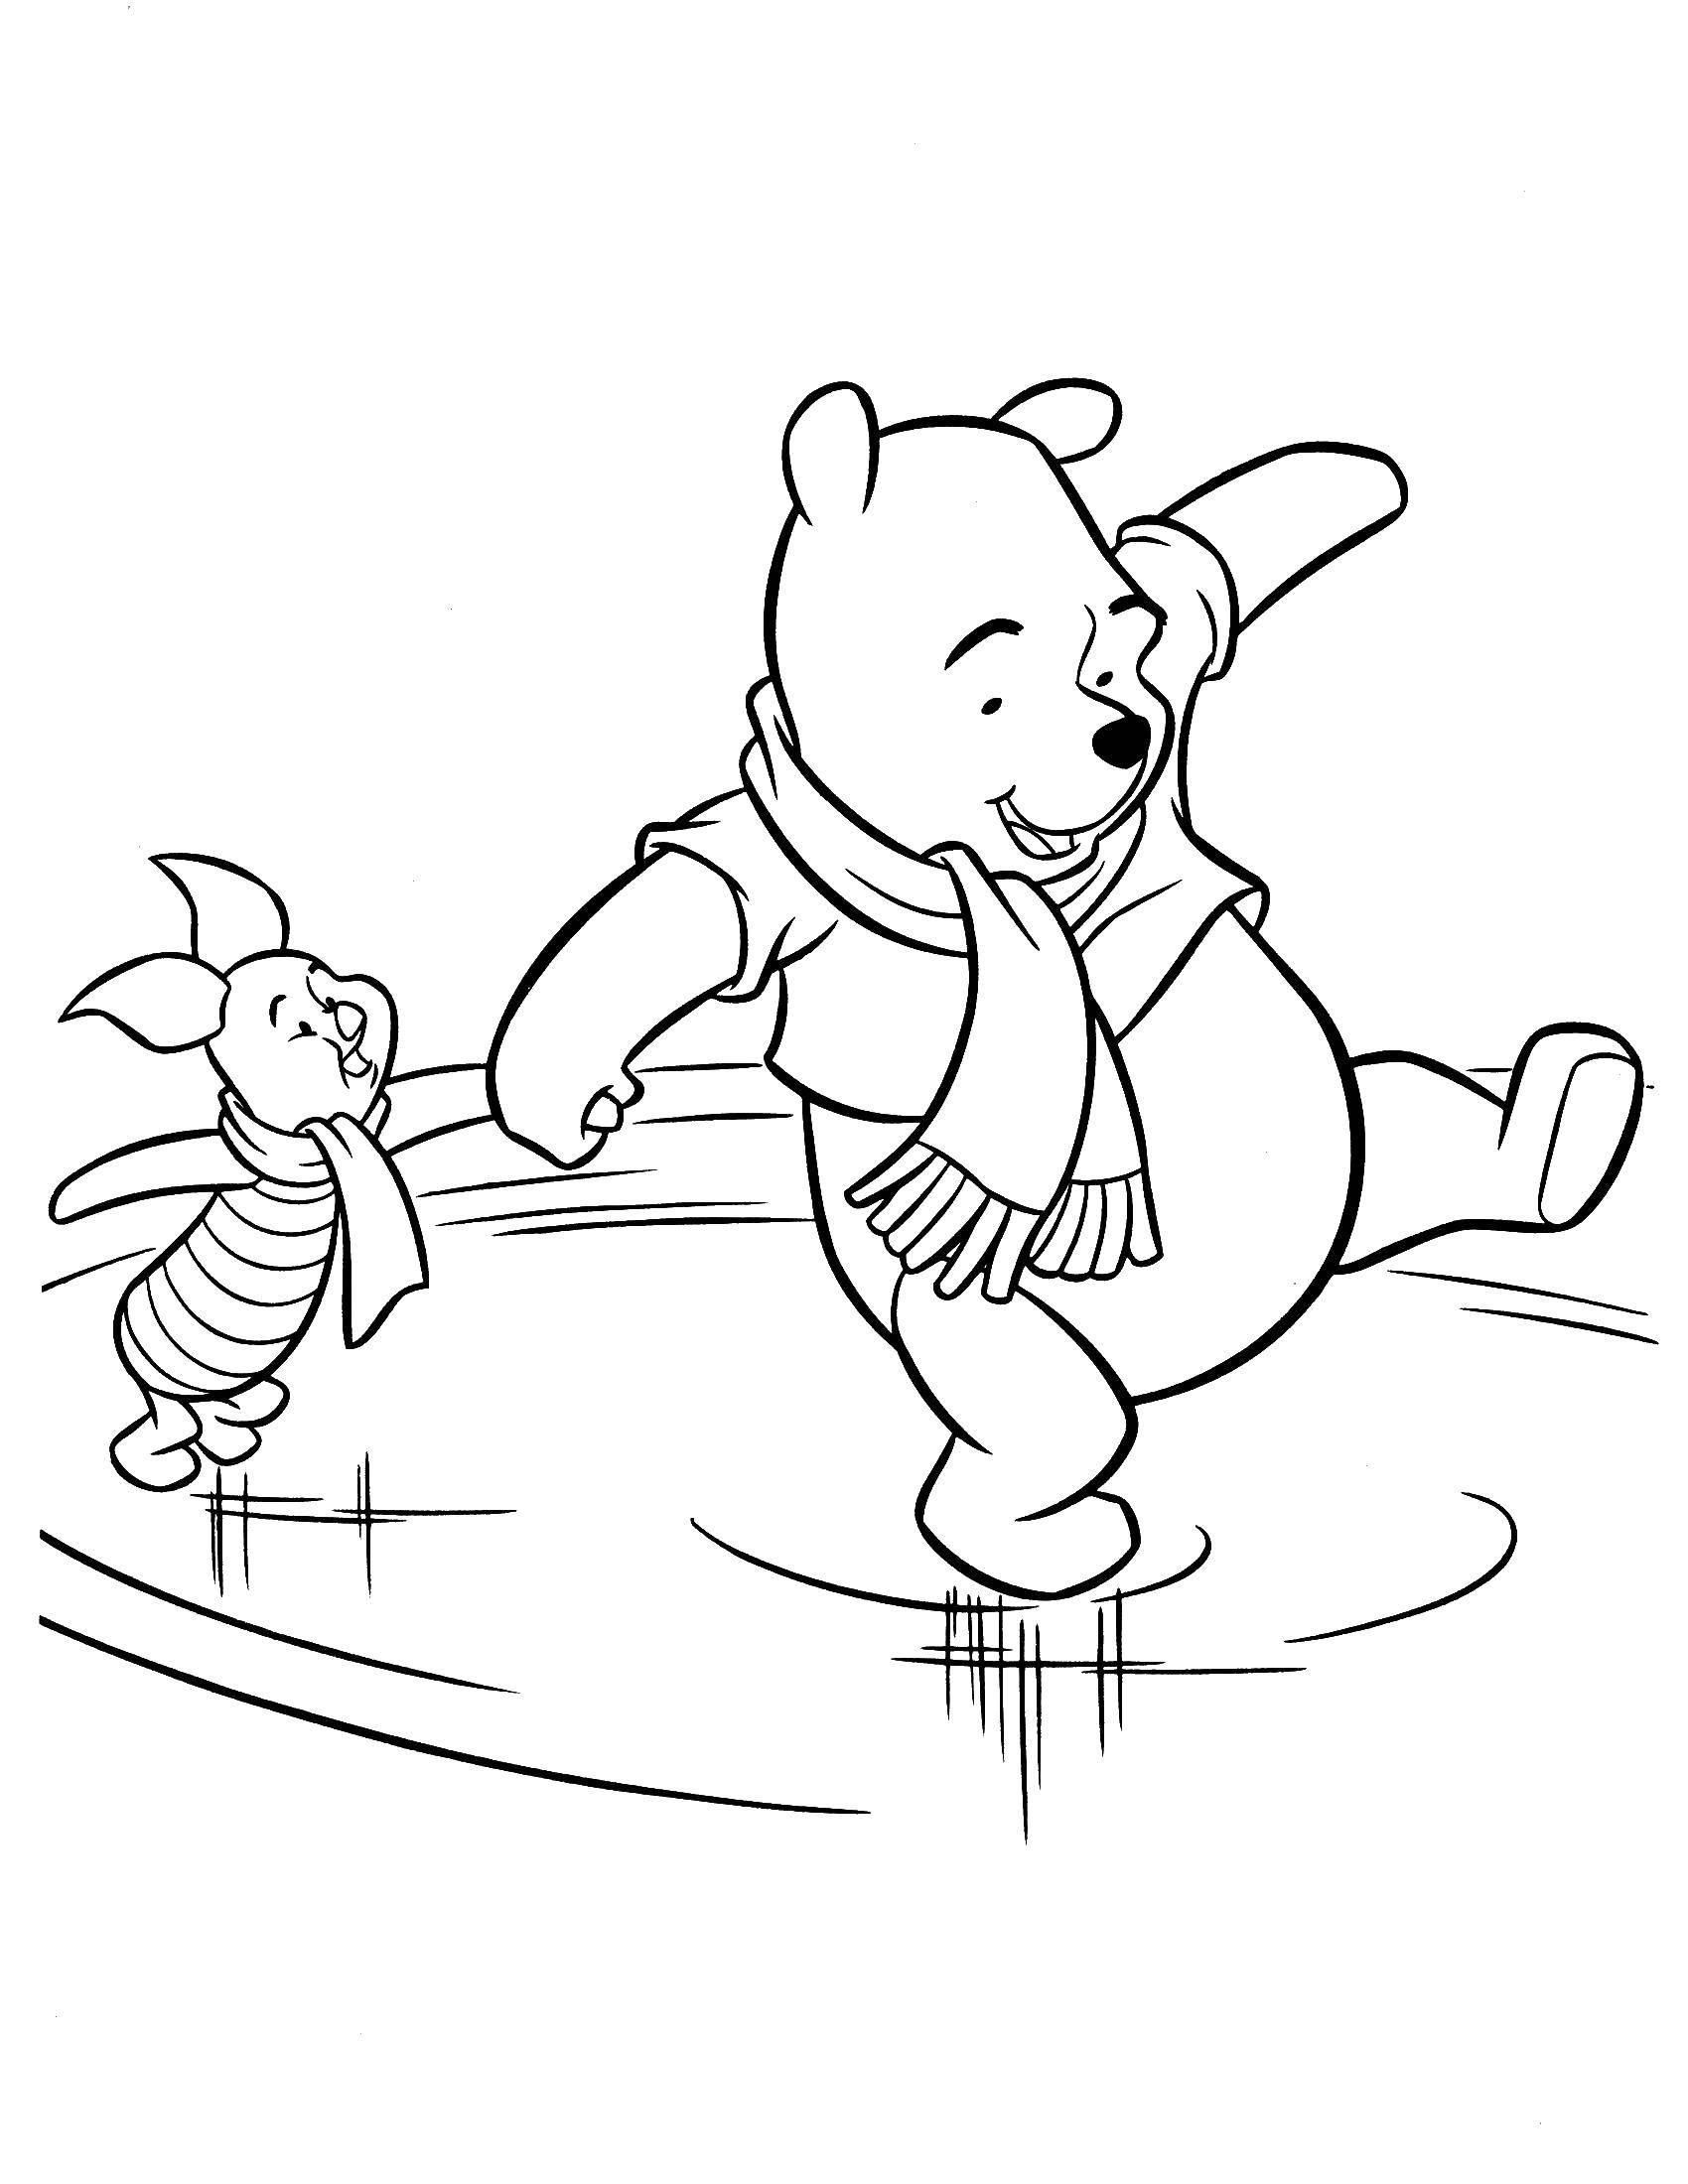 Coloring sheet Disney cartoons Download Togruta, star wars.  Print ,cartoons,